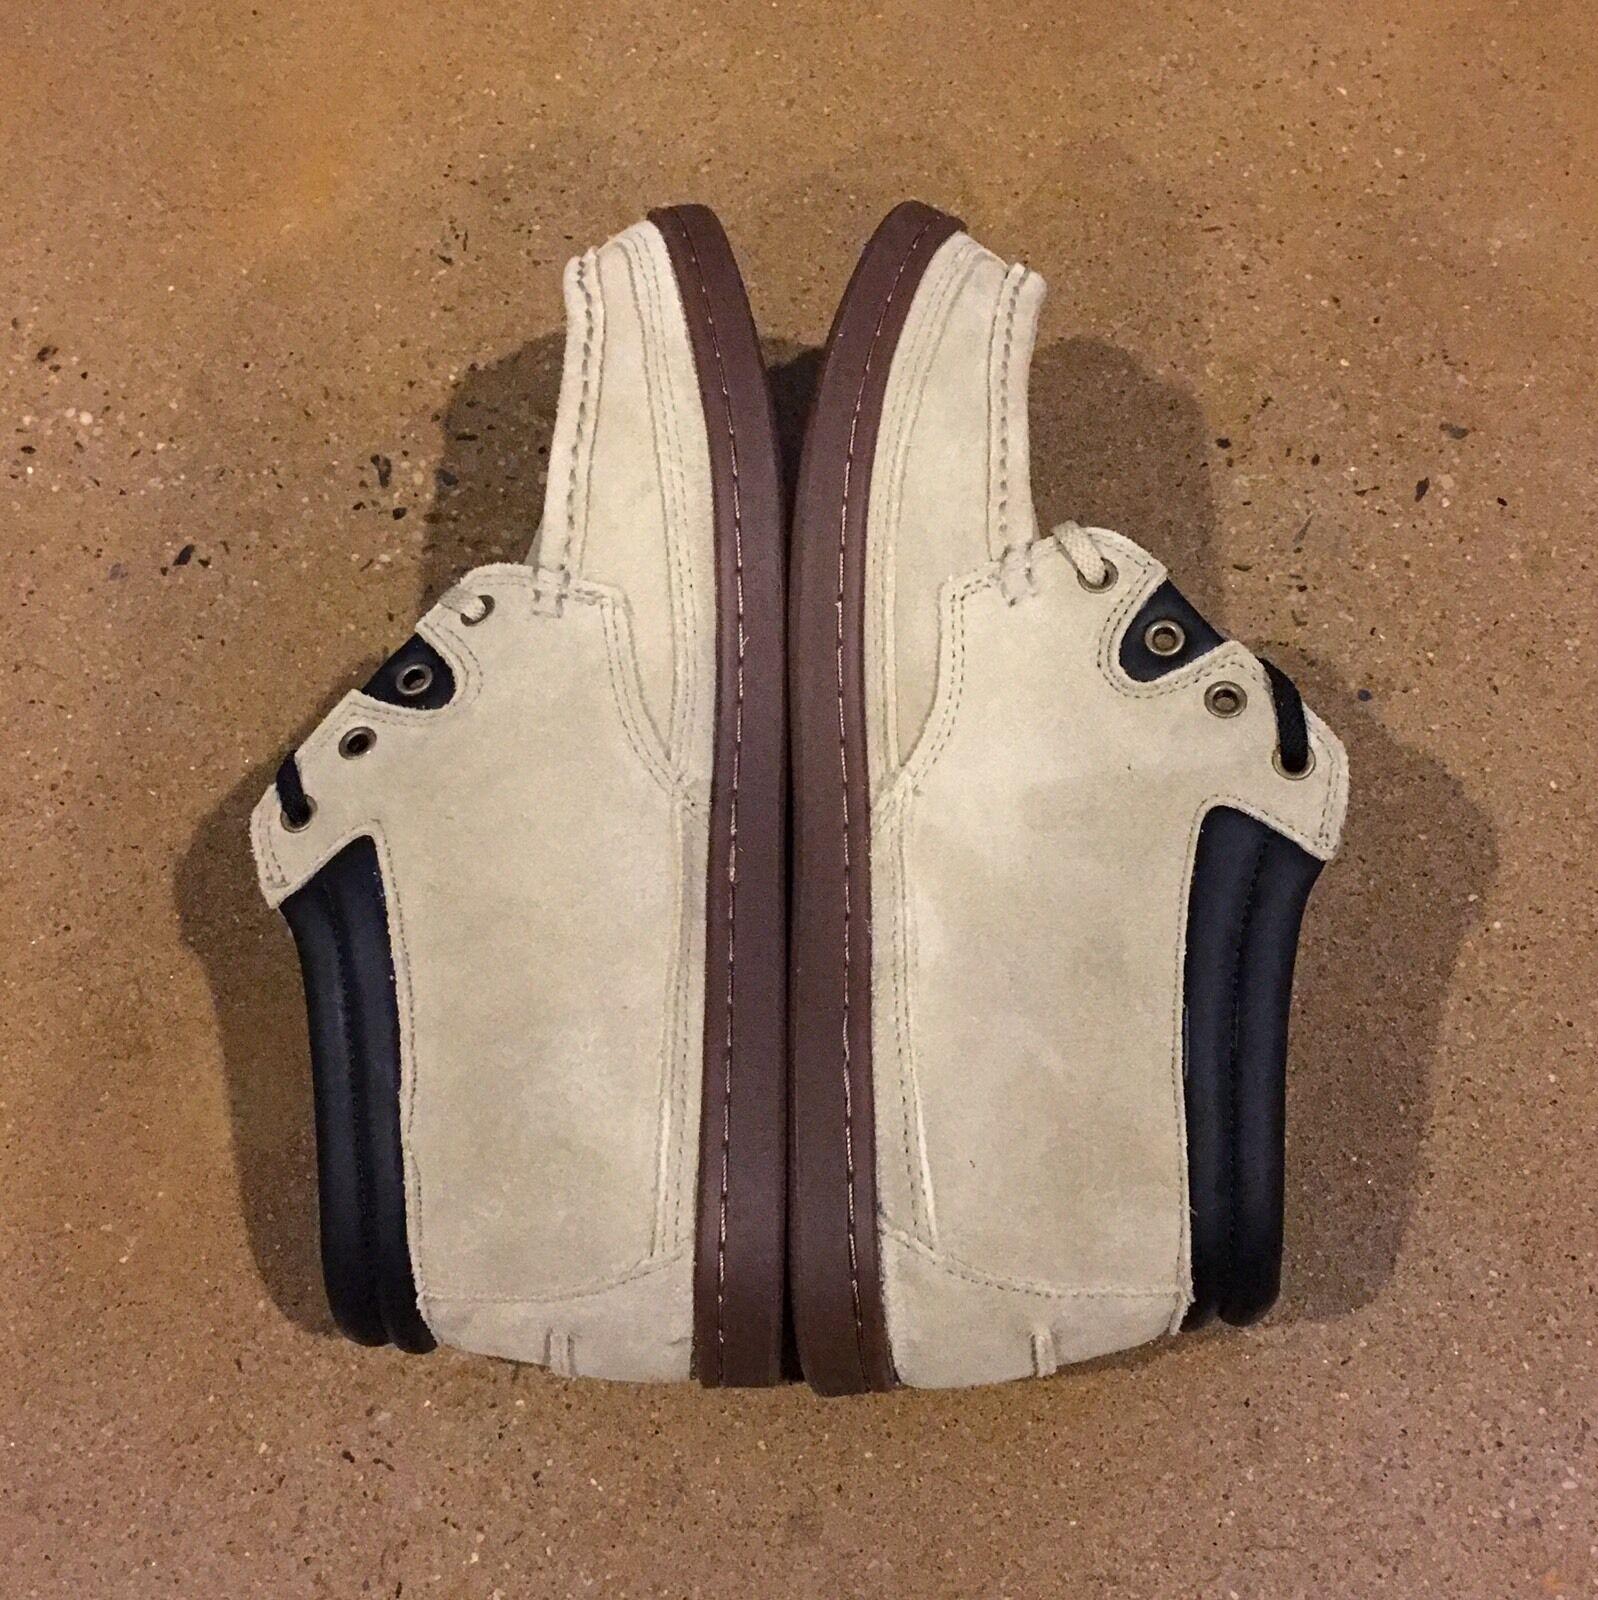 DVS Hunt Tan Suede Size 9.5 US Chukka Boat Deck BMX Skate Shoes Scarpe da Ginnastica